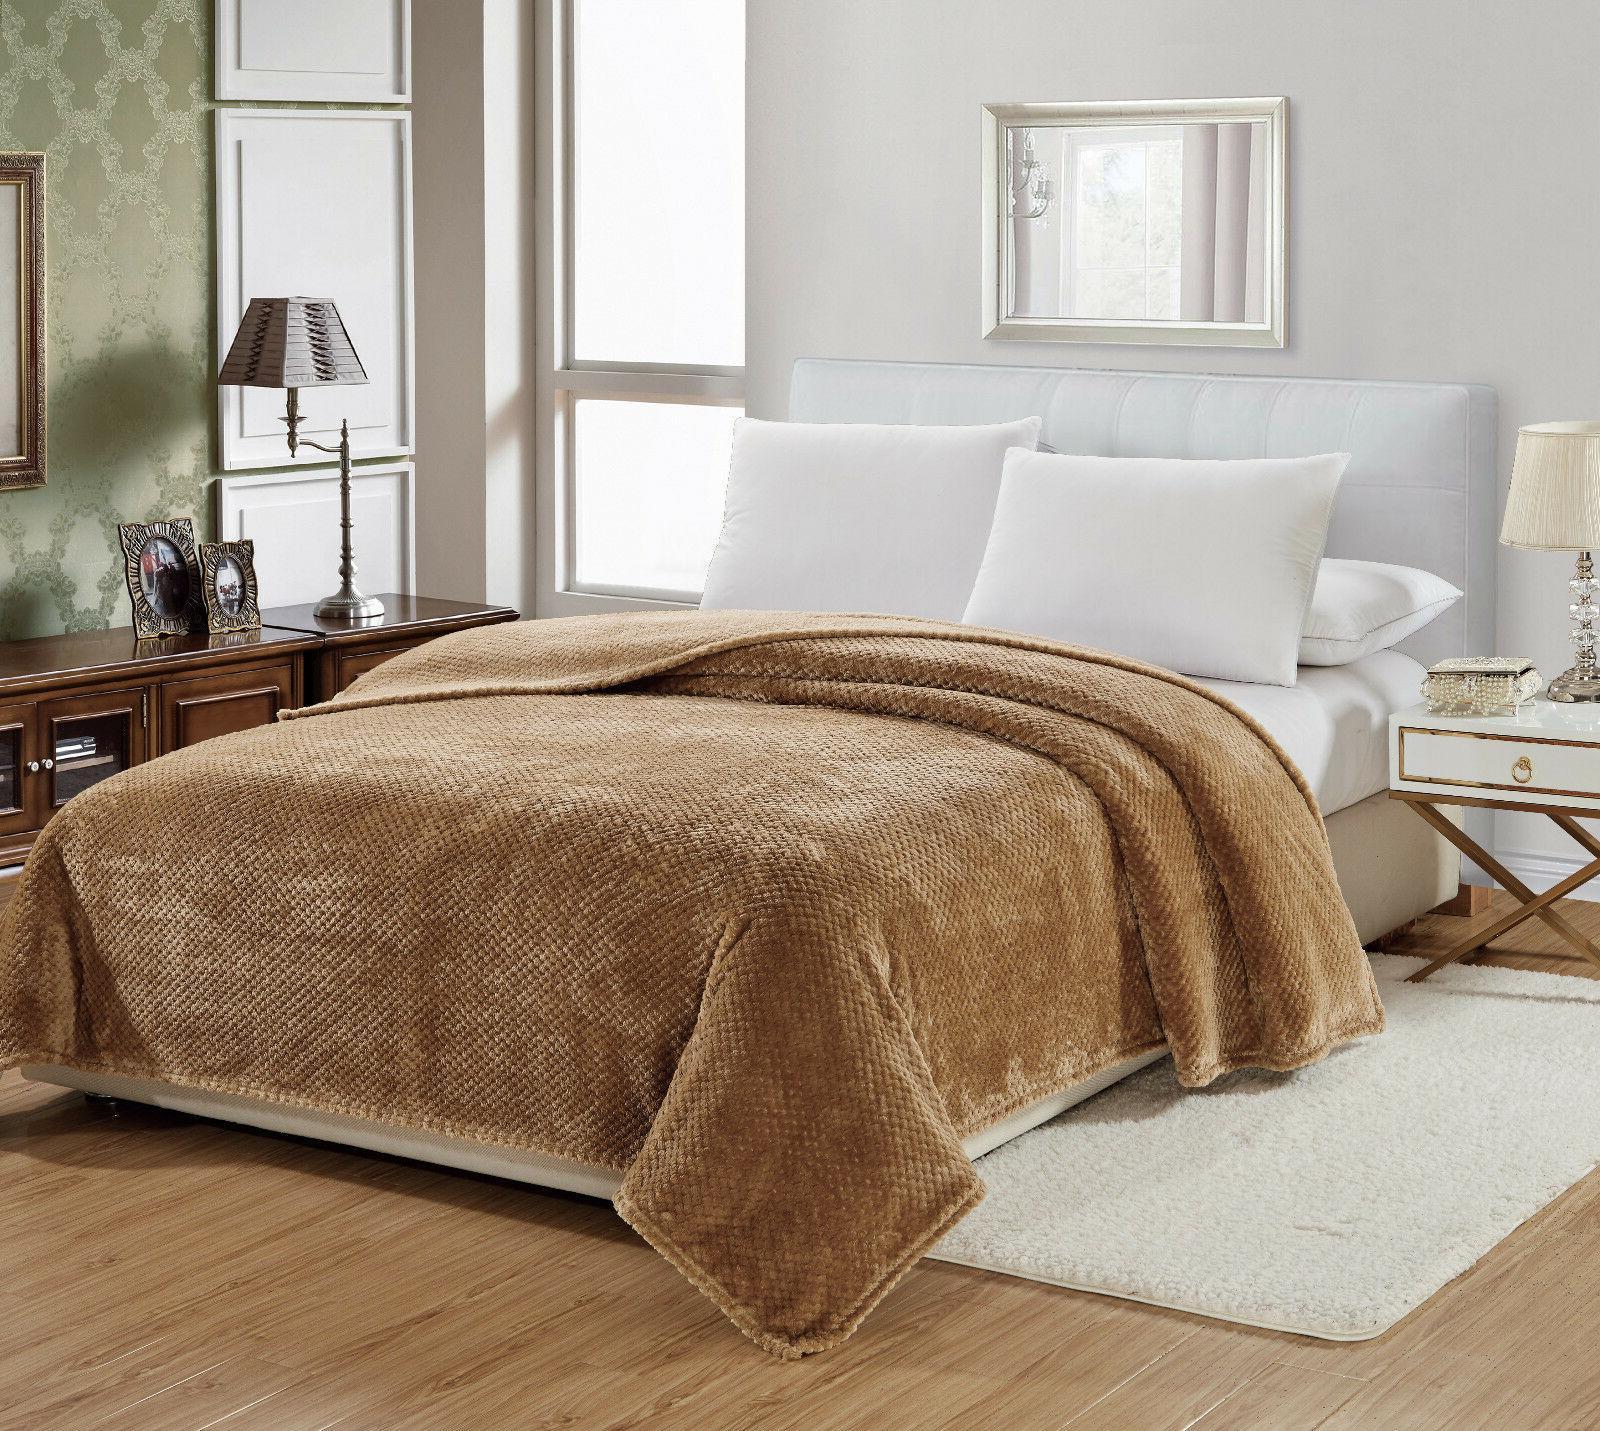 Premium Plush Cozy Fleece Throw Blanket Cover - Assorted Col